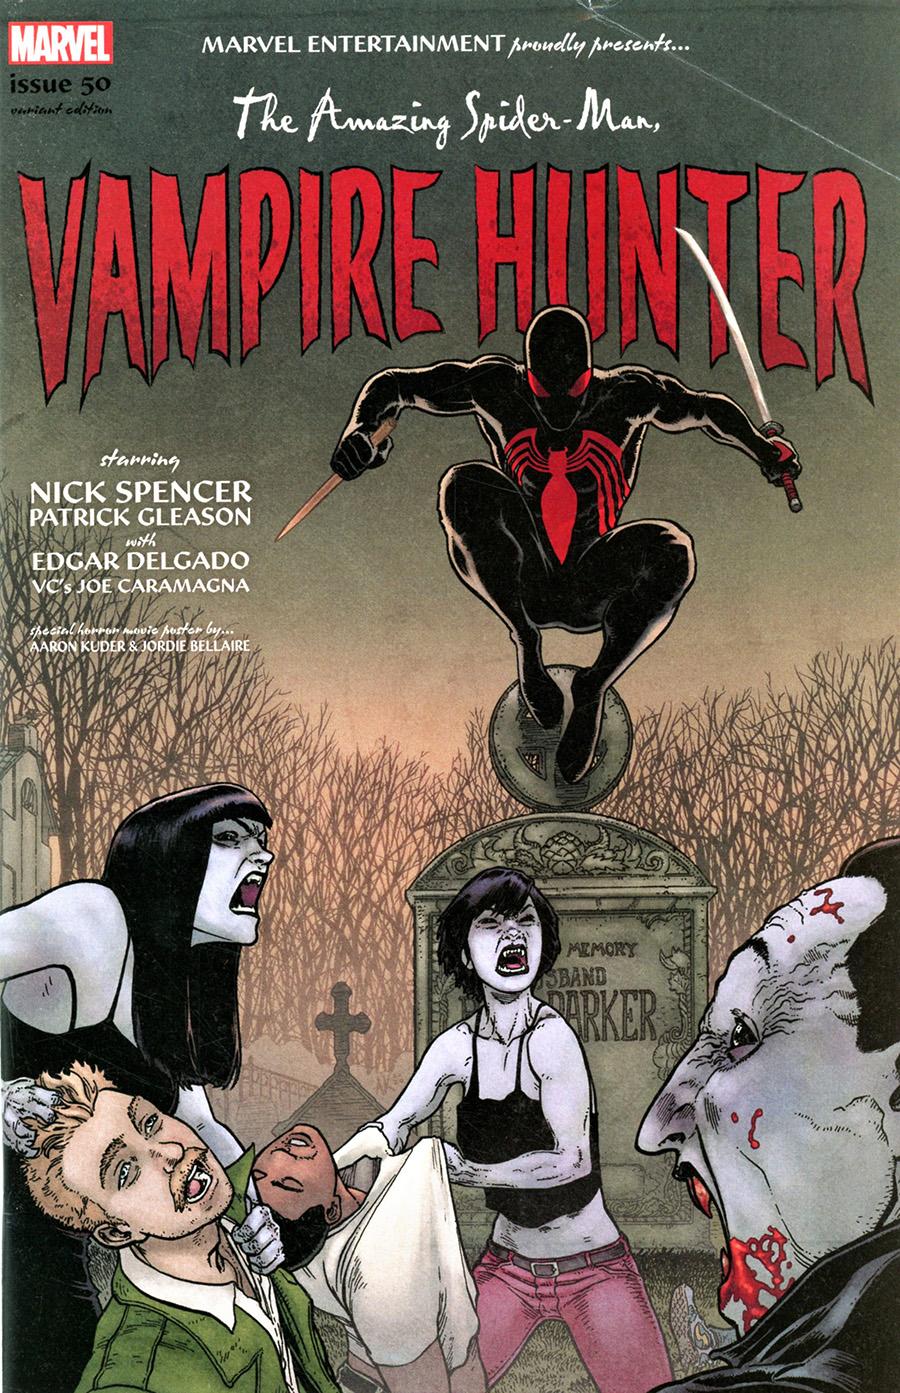 Amazing Spider-Man Vol 5 #50 Cover C Variant Aaron Kuder Spider-Man Vampire Hunter Horror Cover